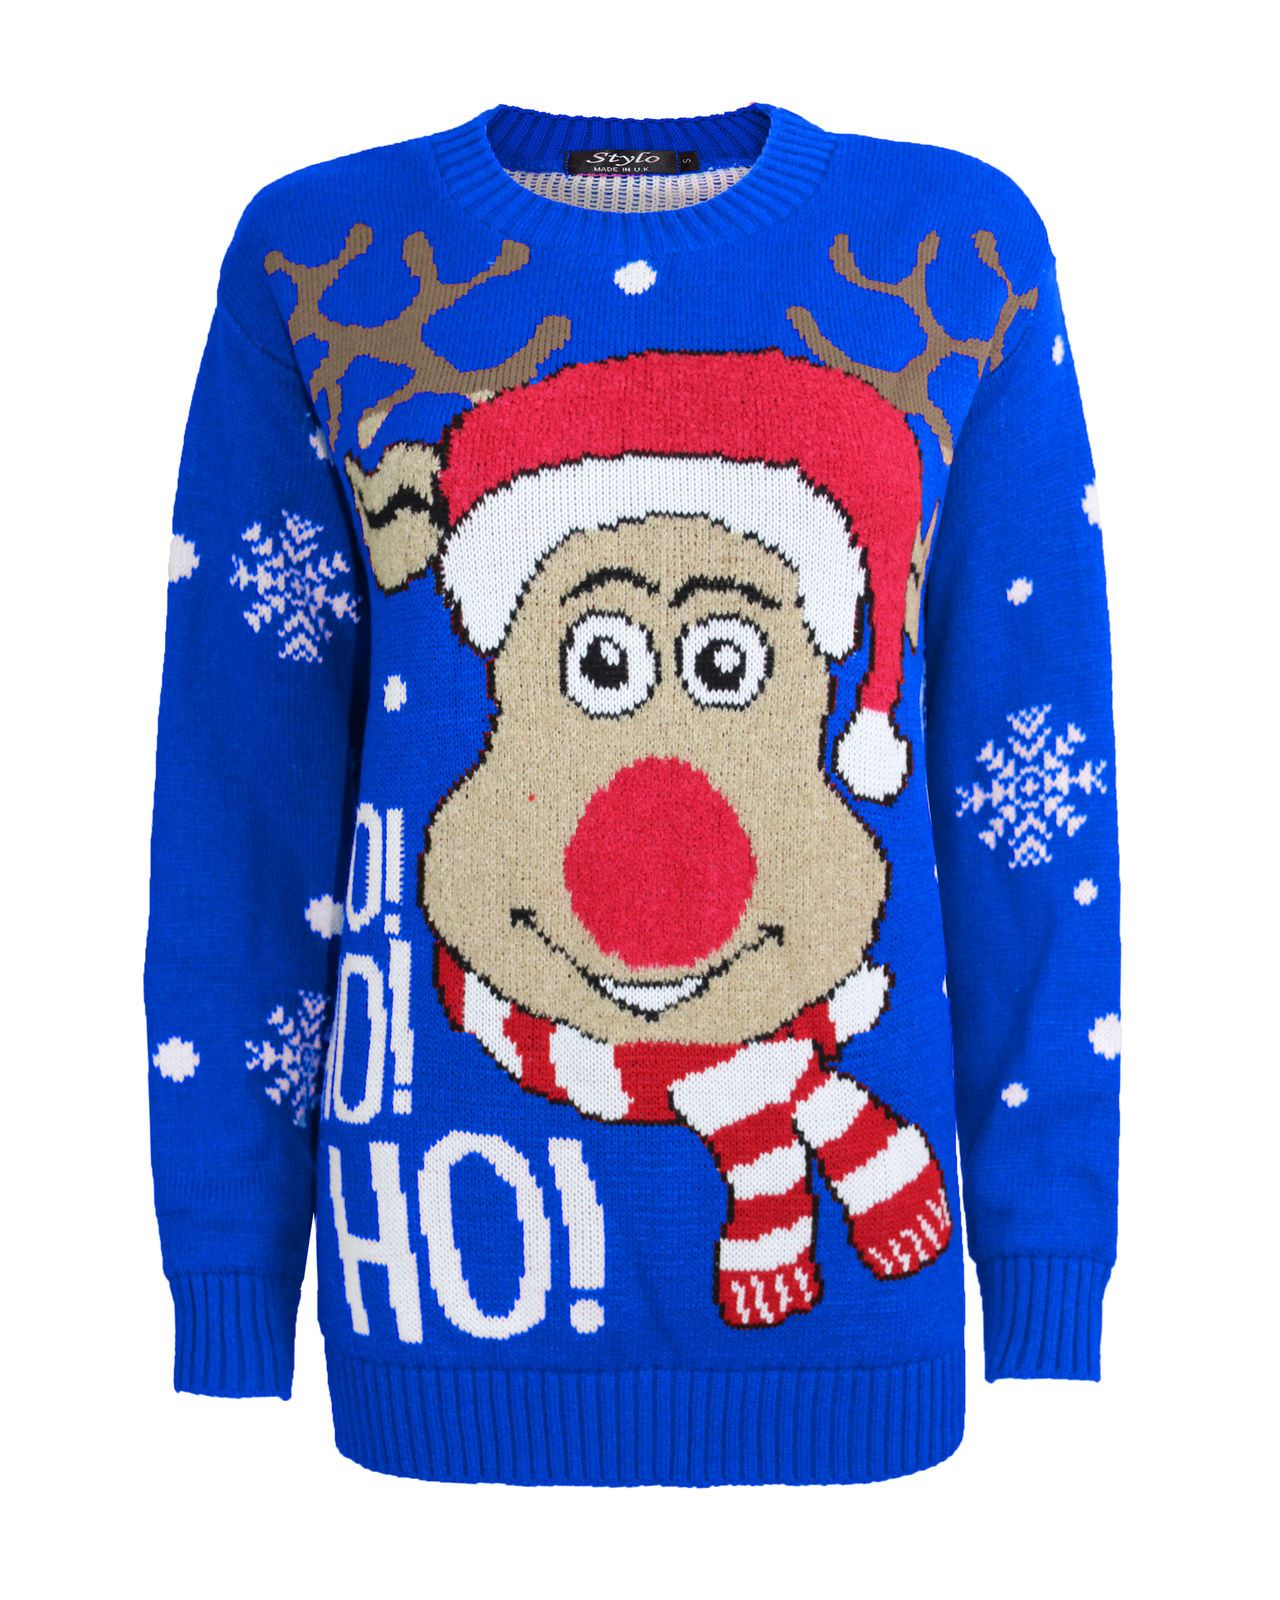 Ladies Women Knitted Reindeer HoHoHo Christmas Xmas Kids Chunky Knit Jumper T...